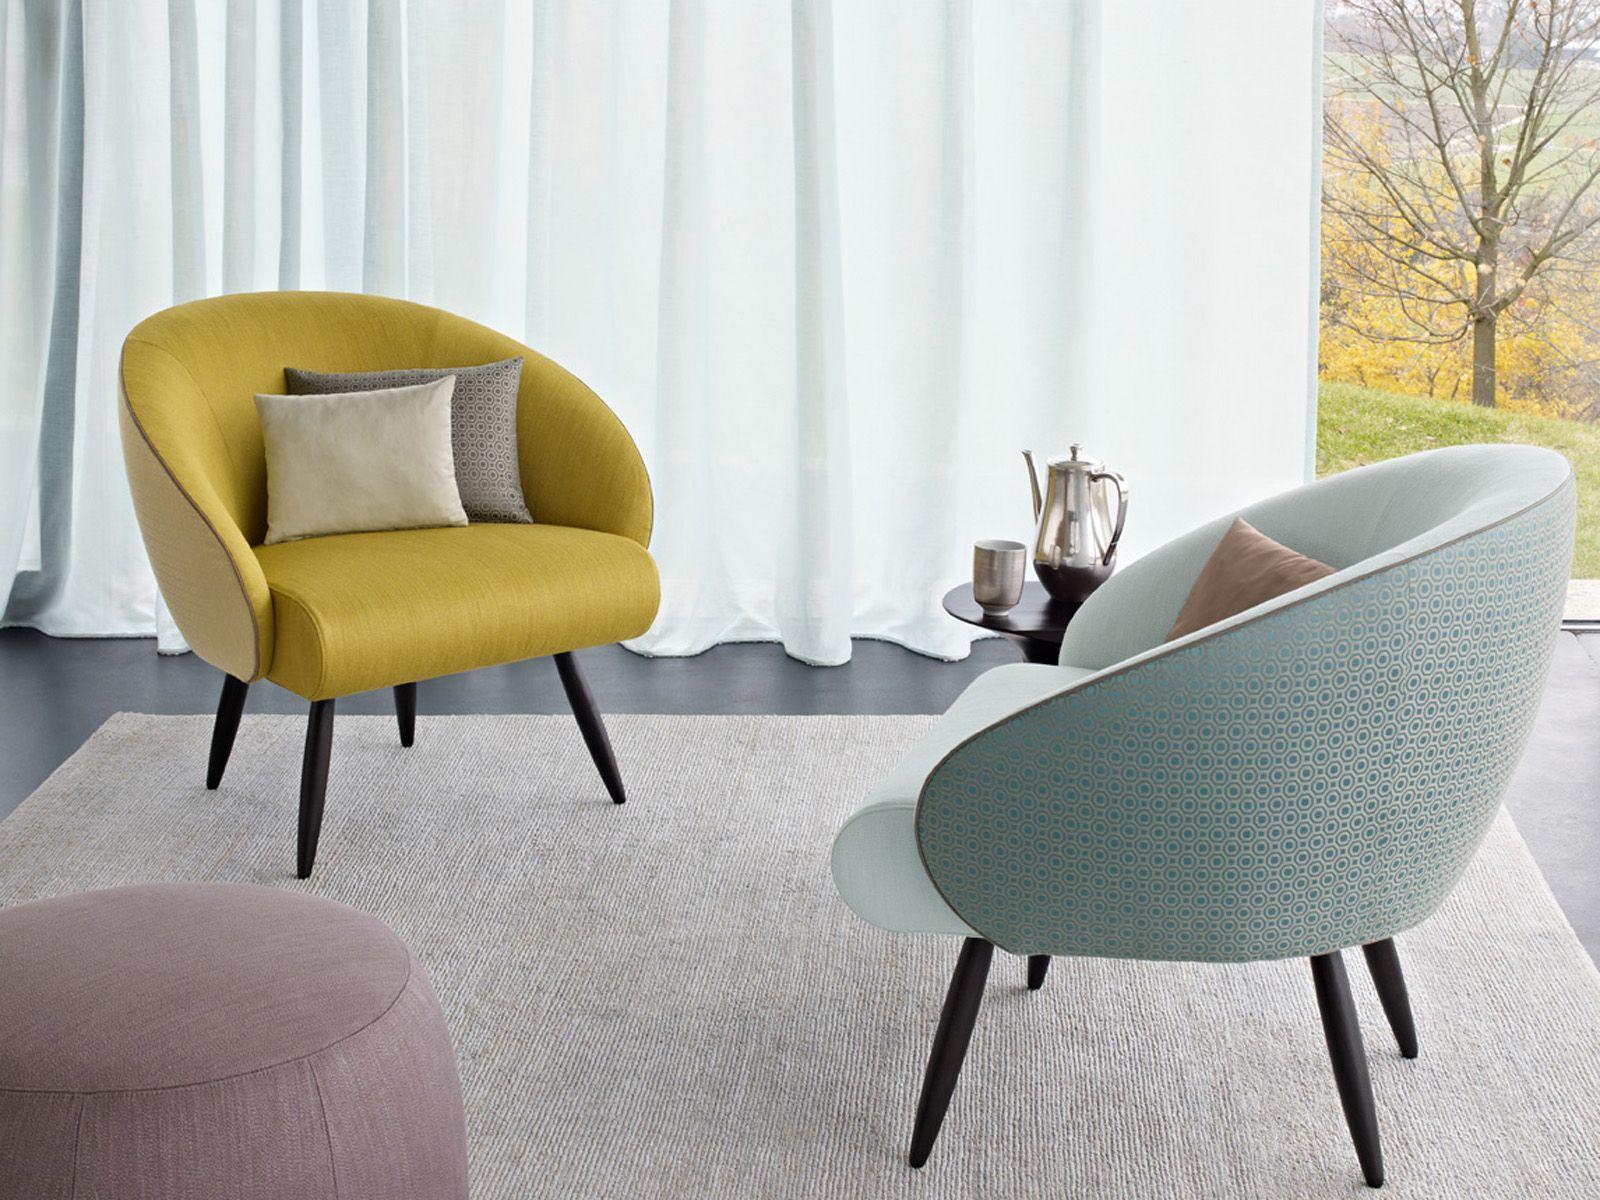 Stoffe | Zimmer + Rohde | Chair | Pinterest